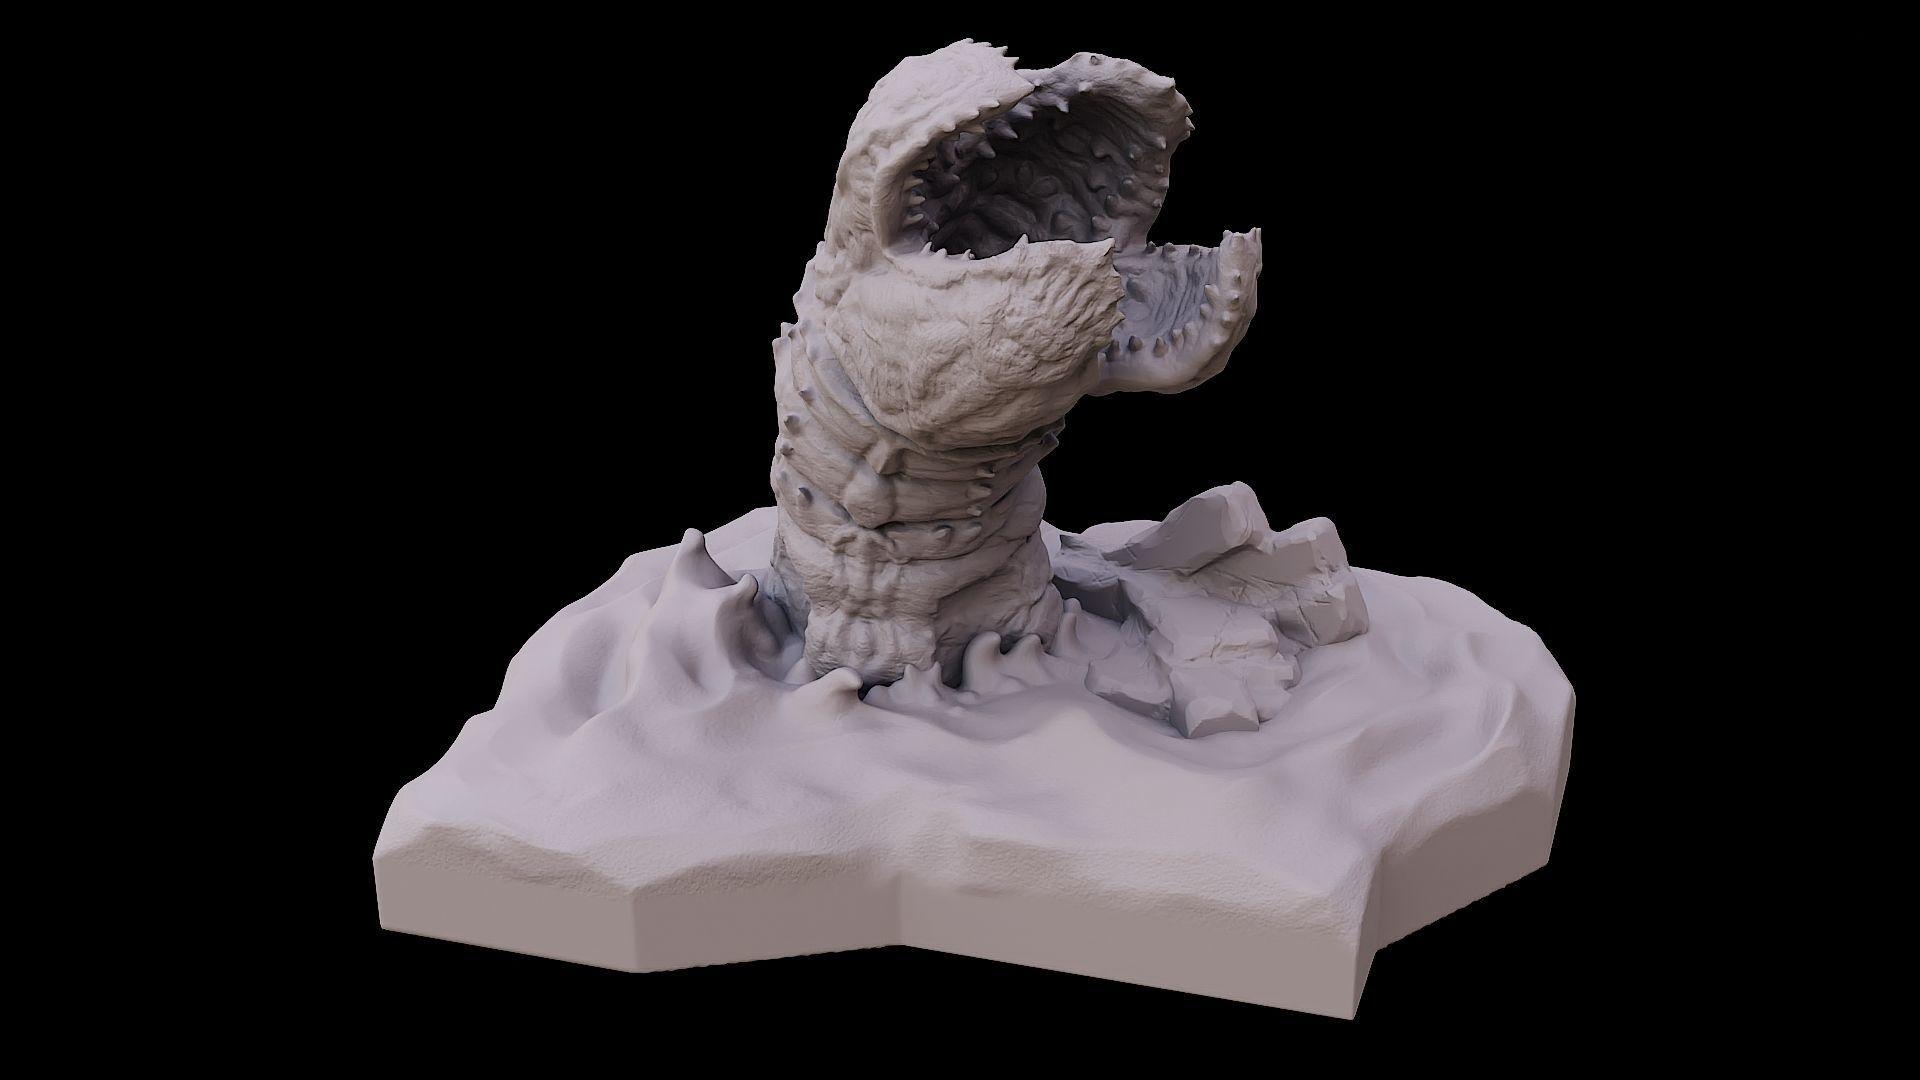 Desert worm in dunes sci fi creature